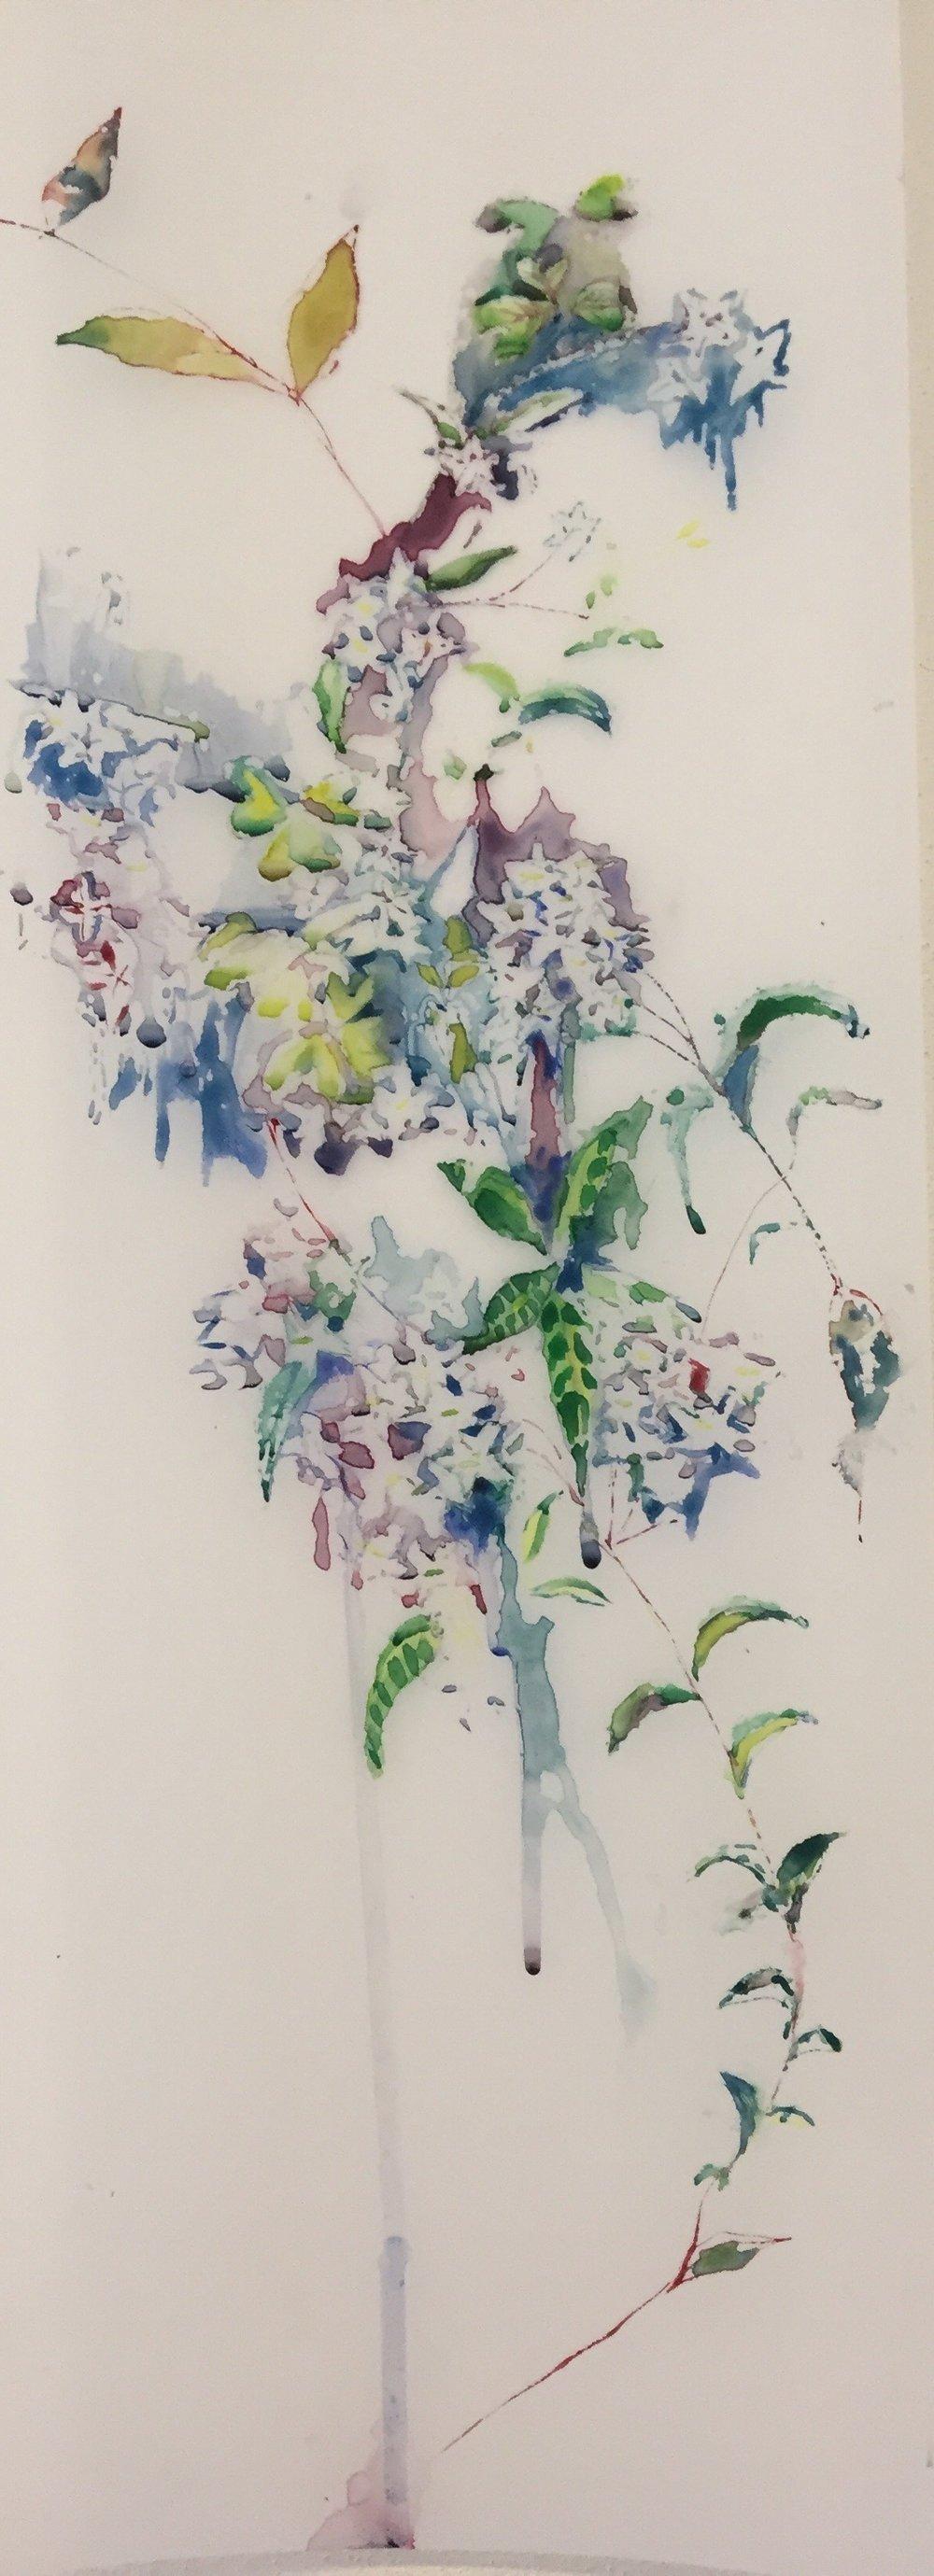 Flowers Bursting 2